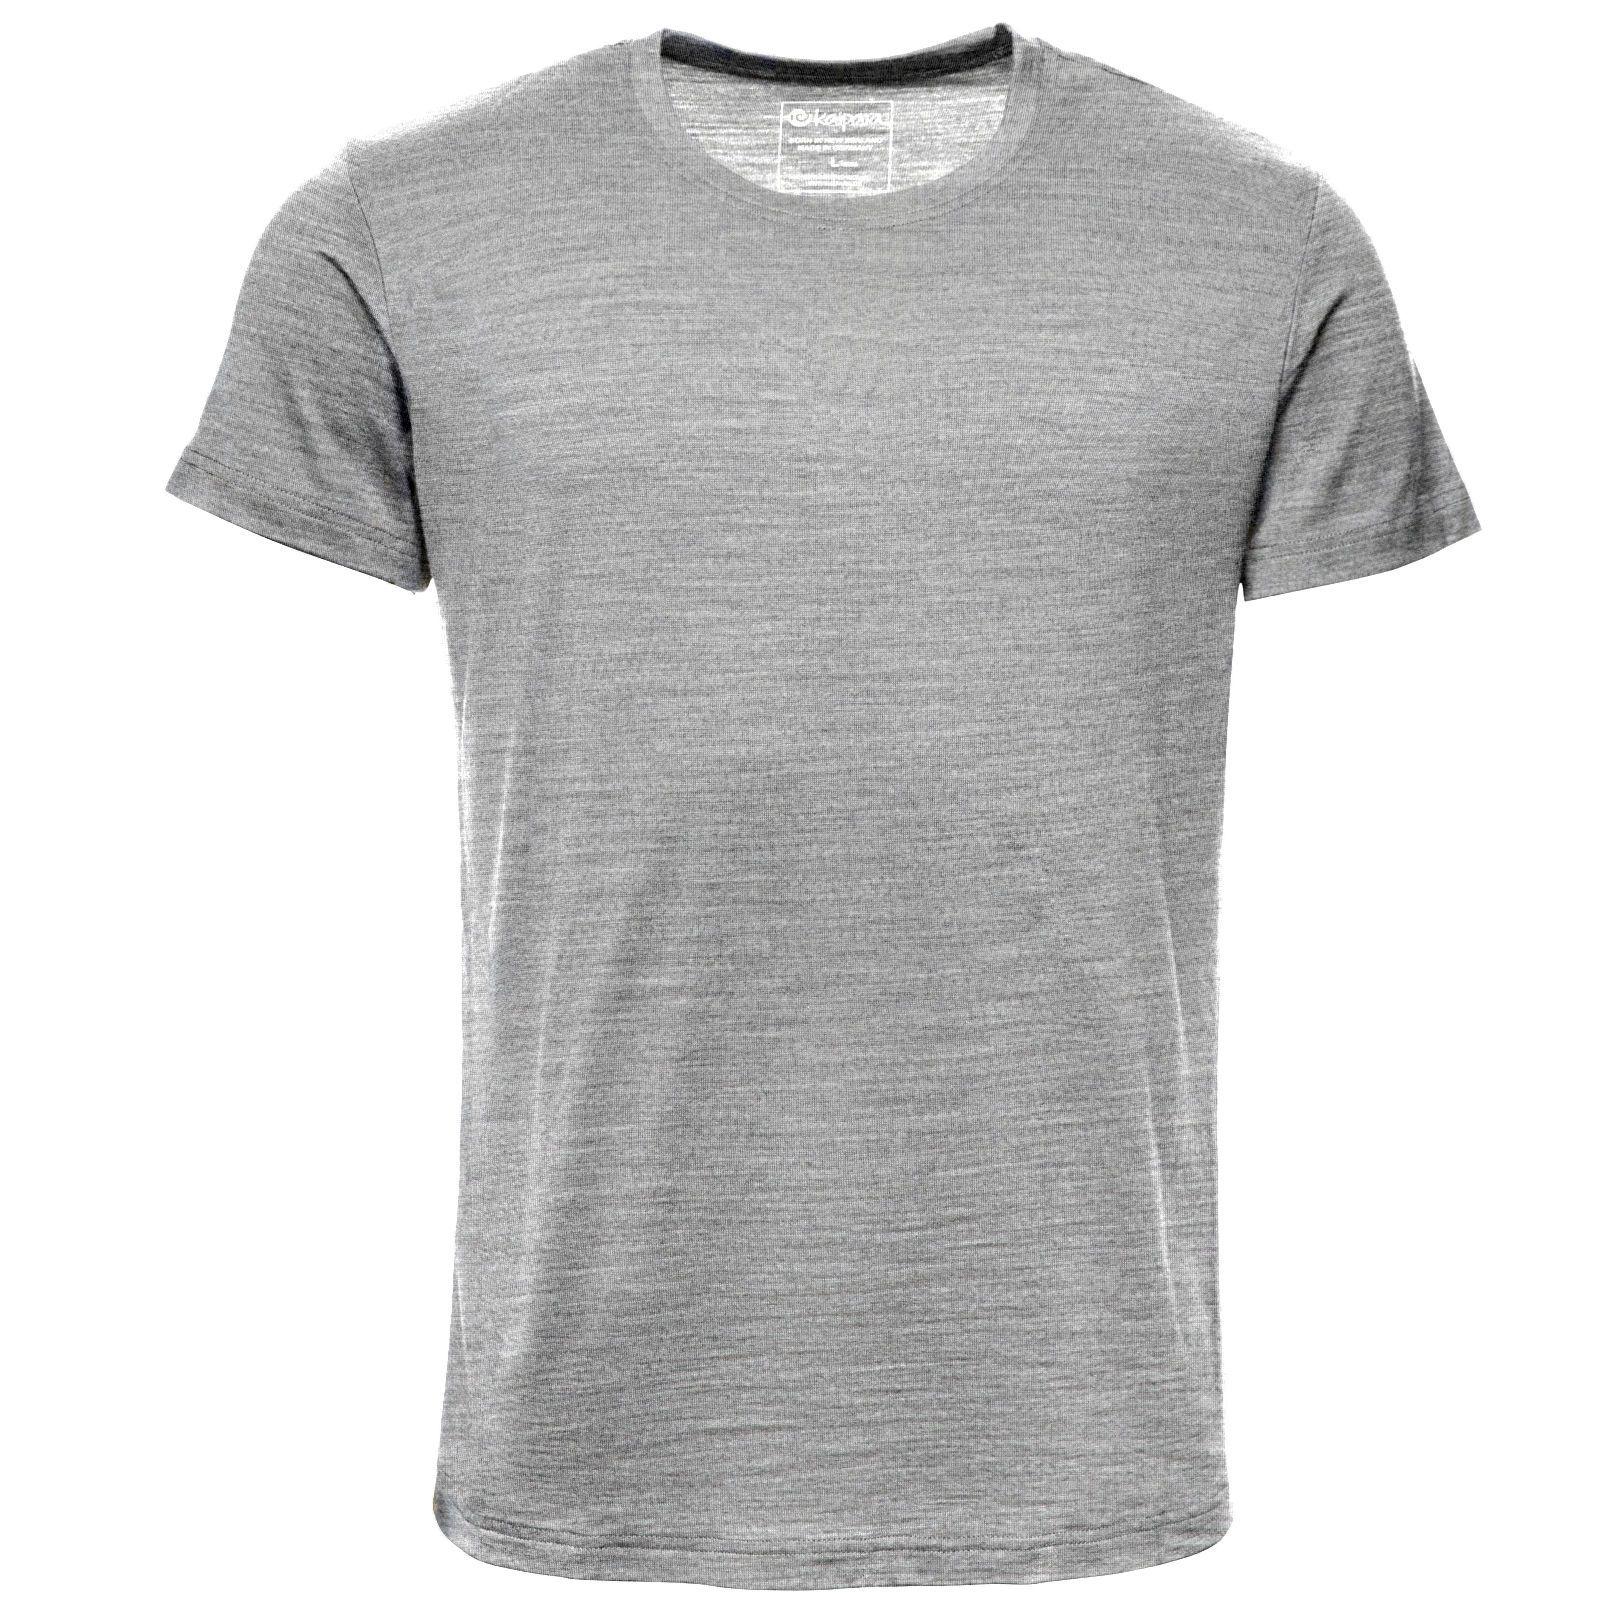 URBAN Merino T-Shirt Herren Kurzarm Regular 150